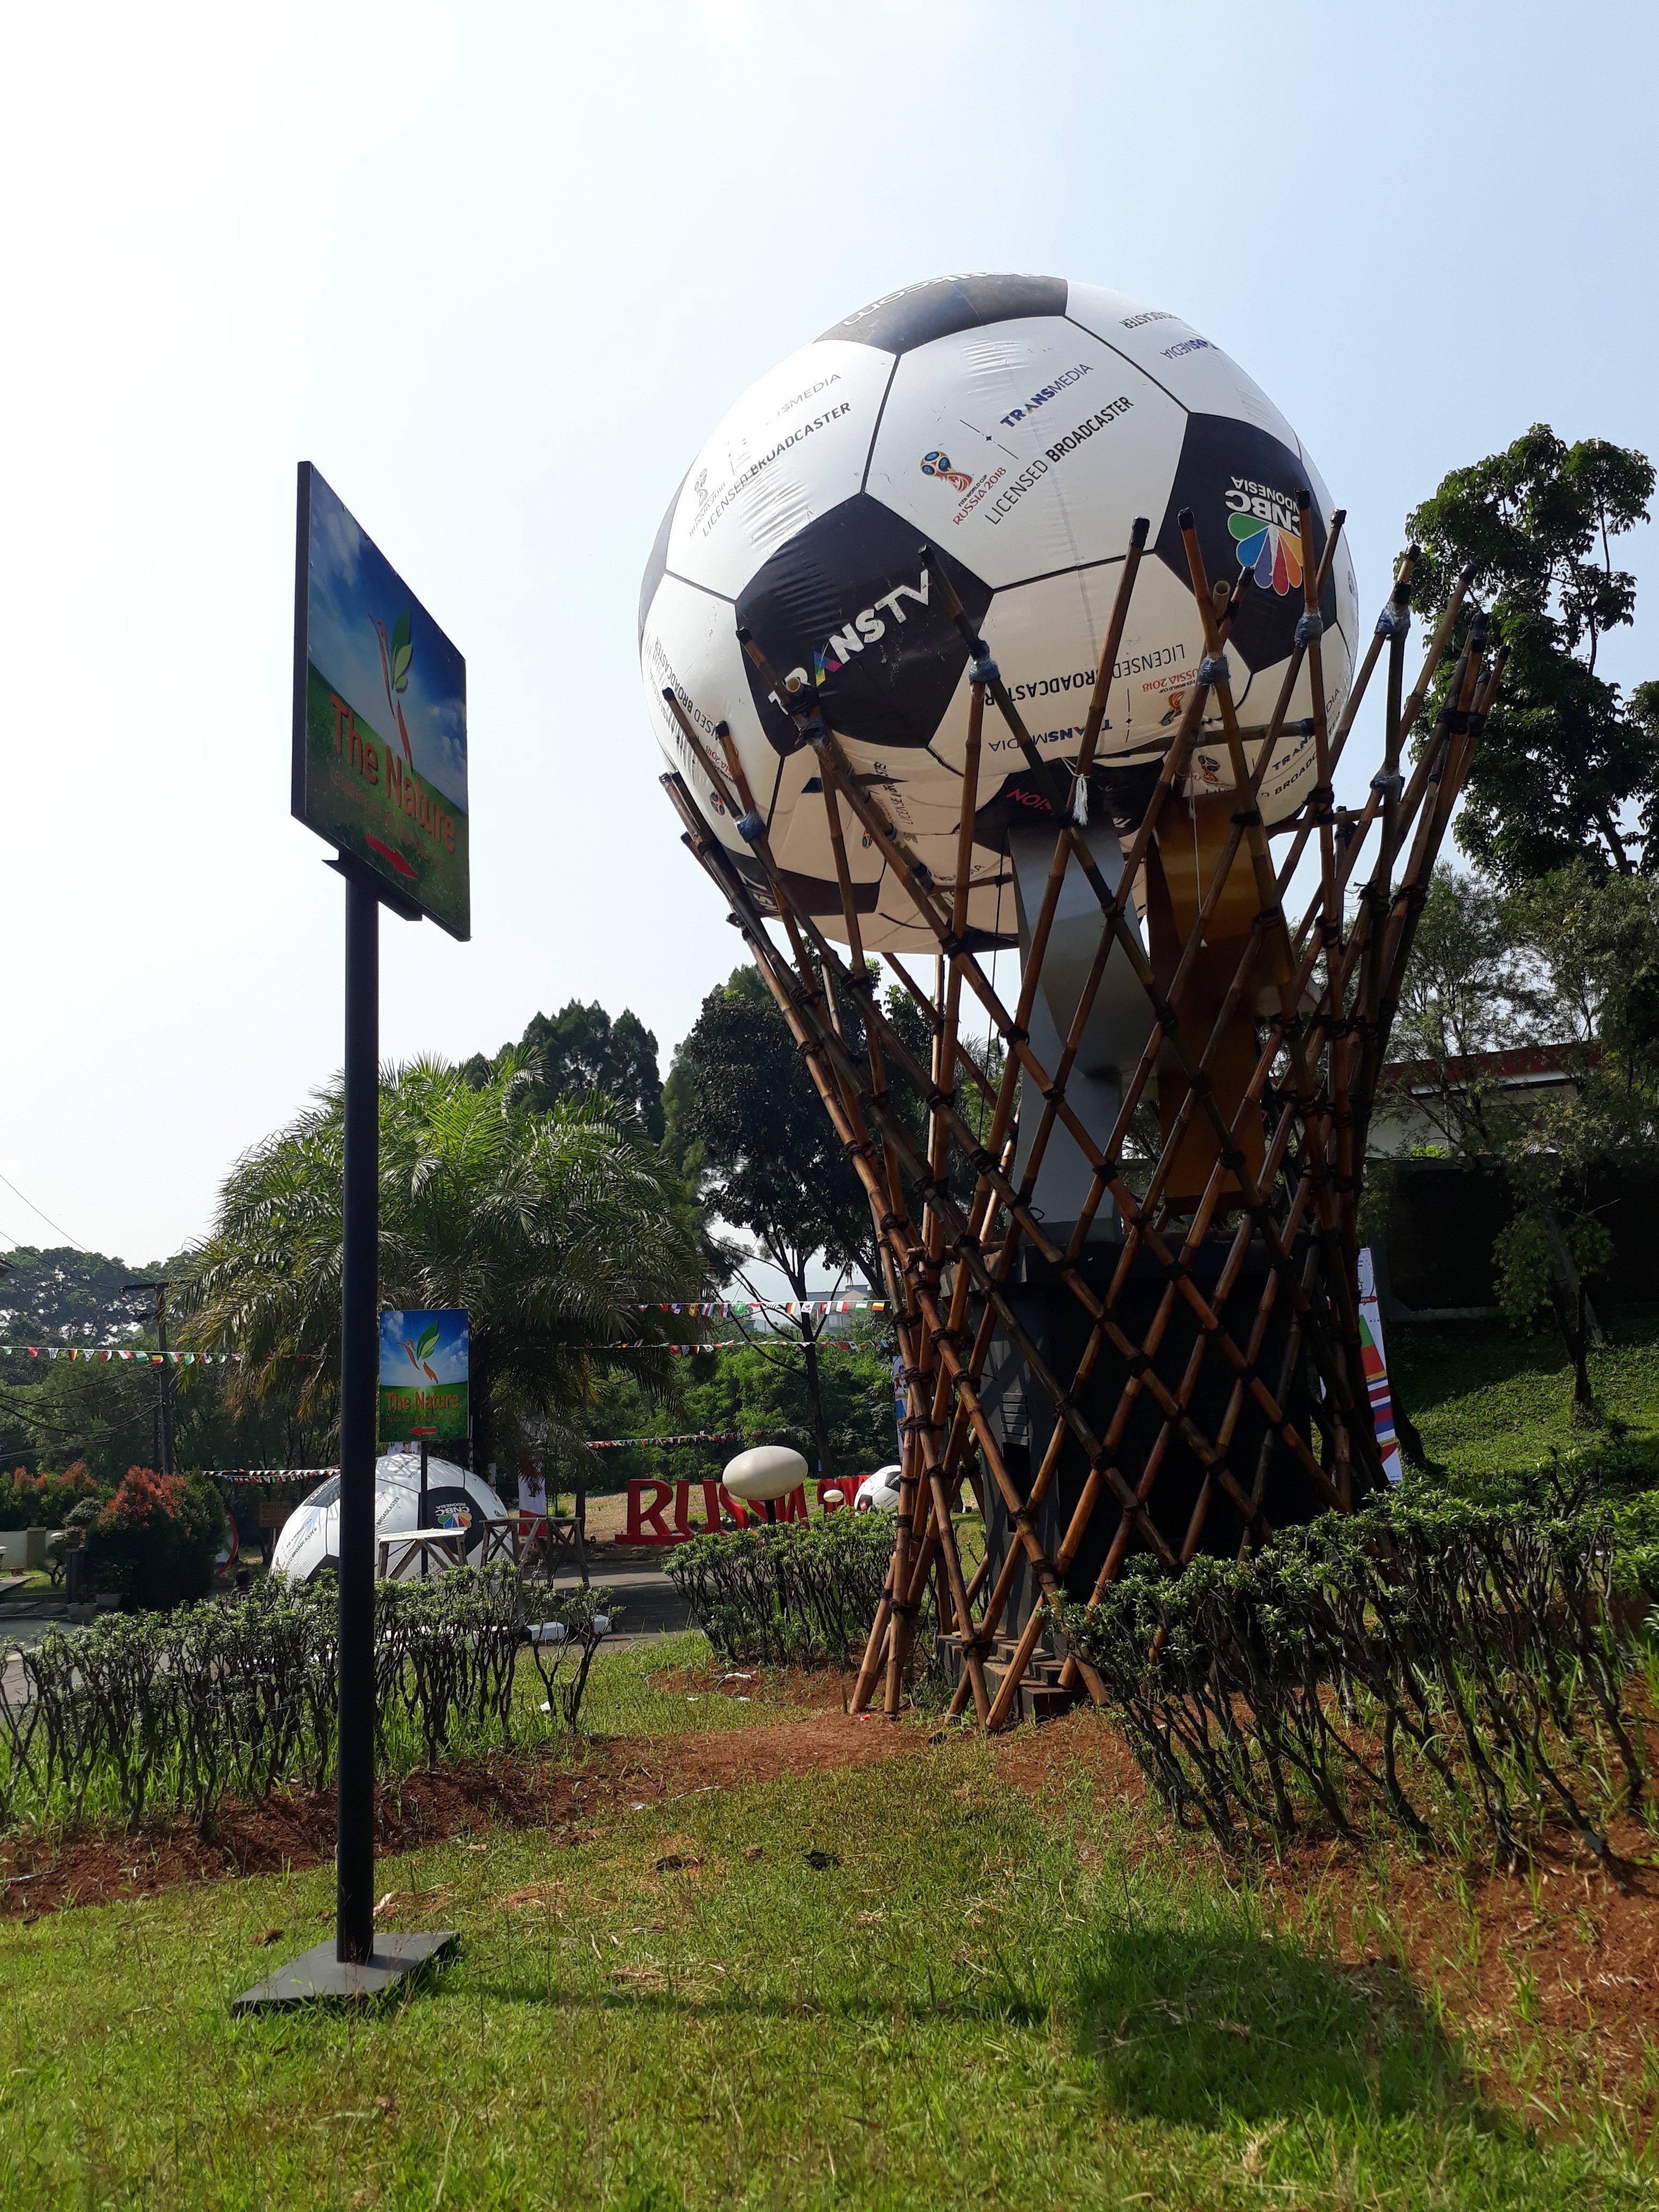 rental balon raksasa udara, sewa balon bulat bola, rental balon oval kotak square